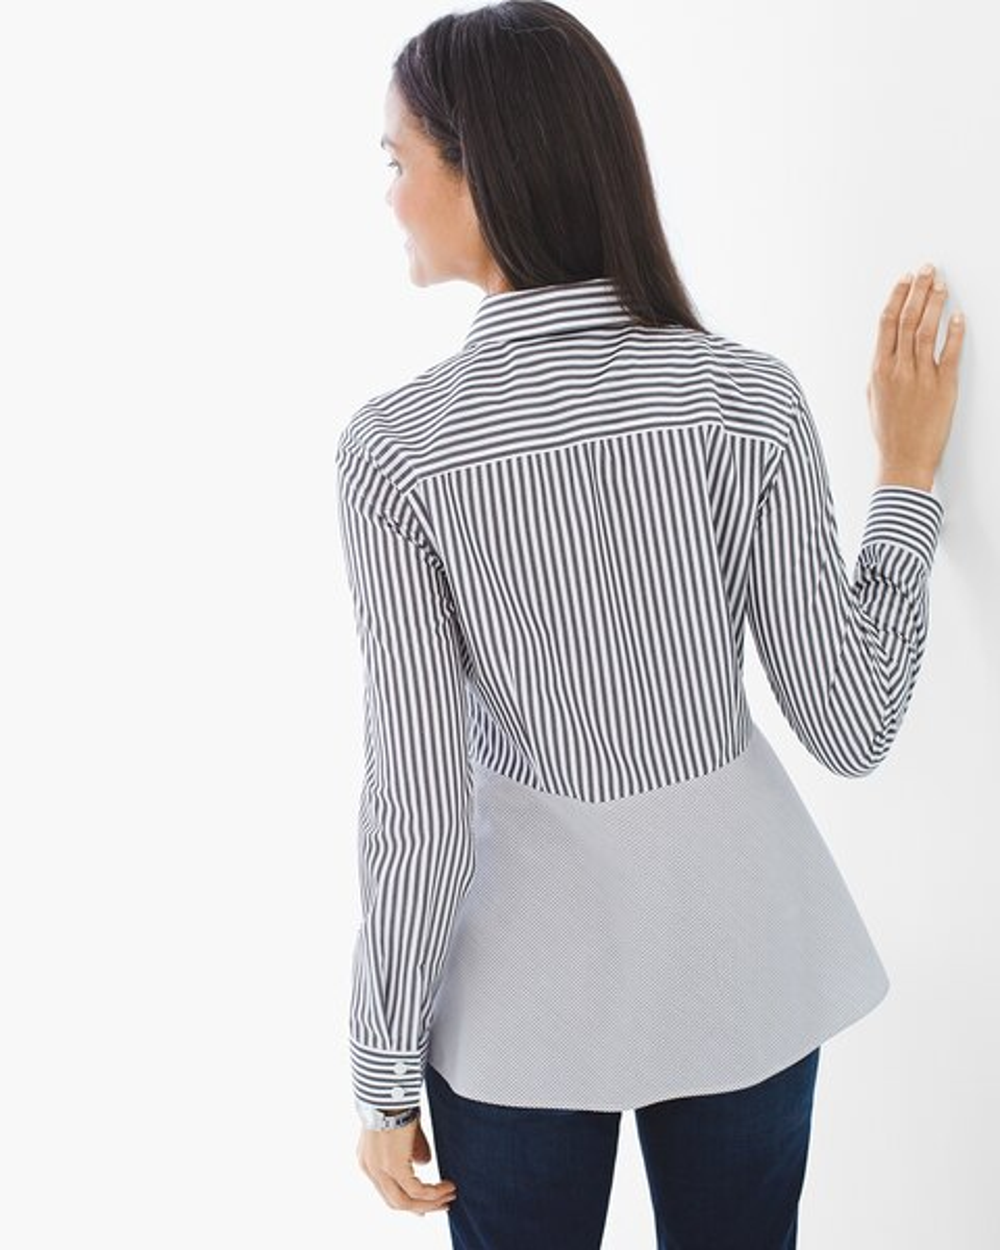 Twin Stripes Peplum Shirt Chicos